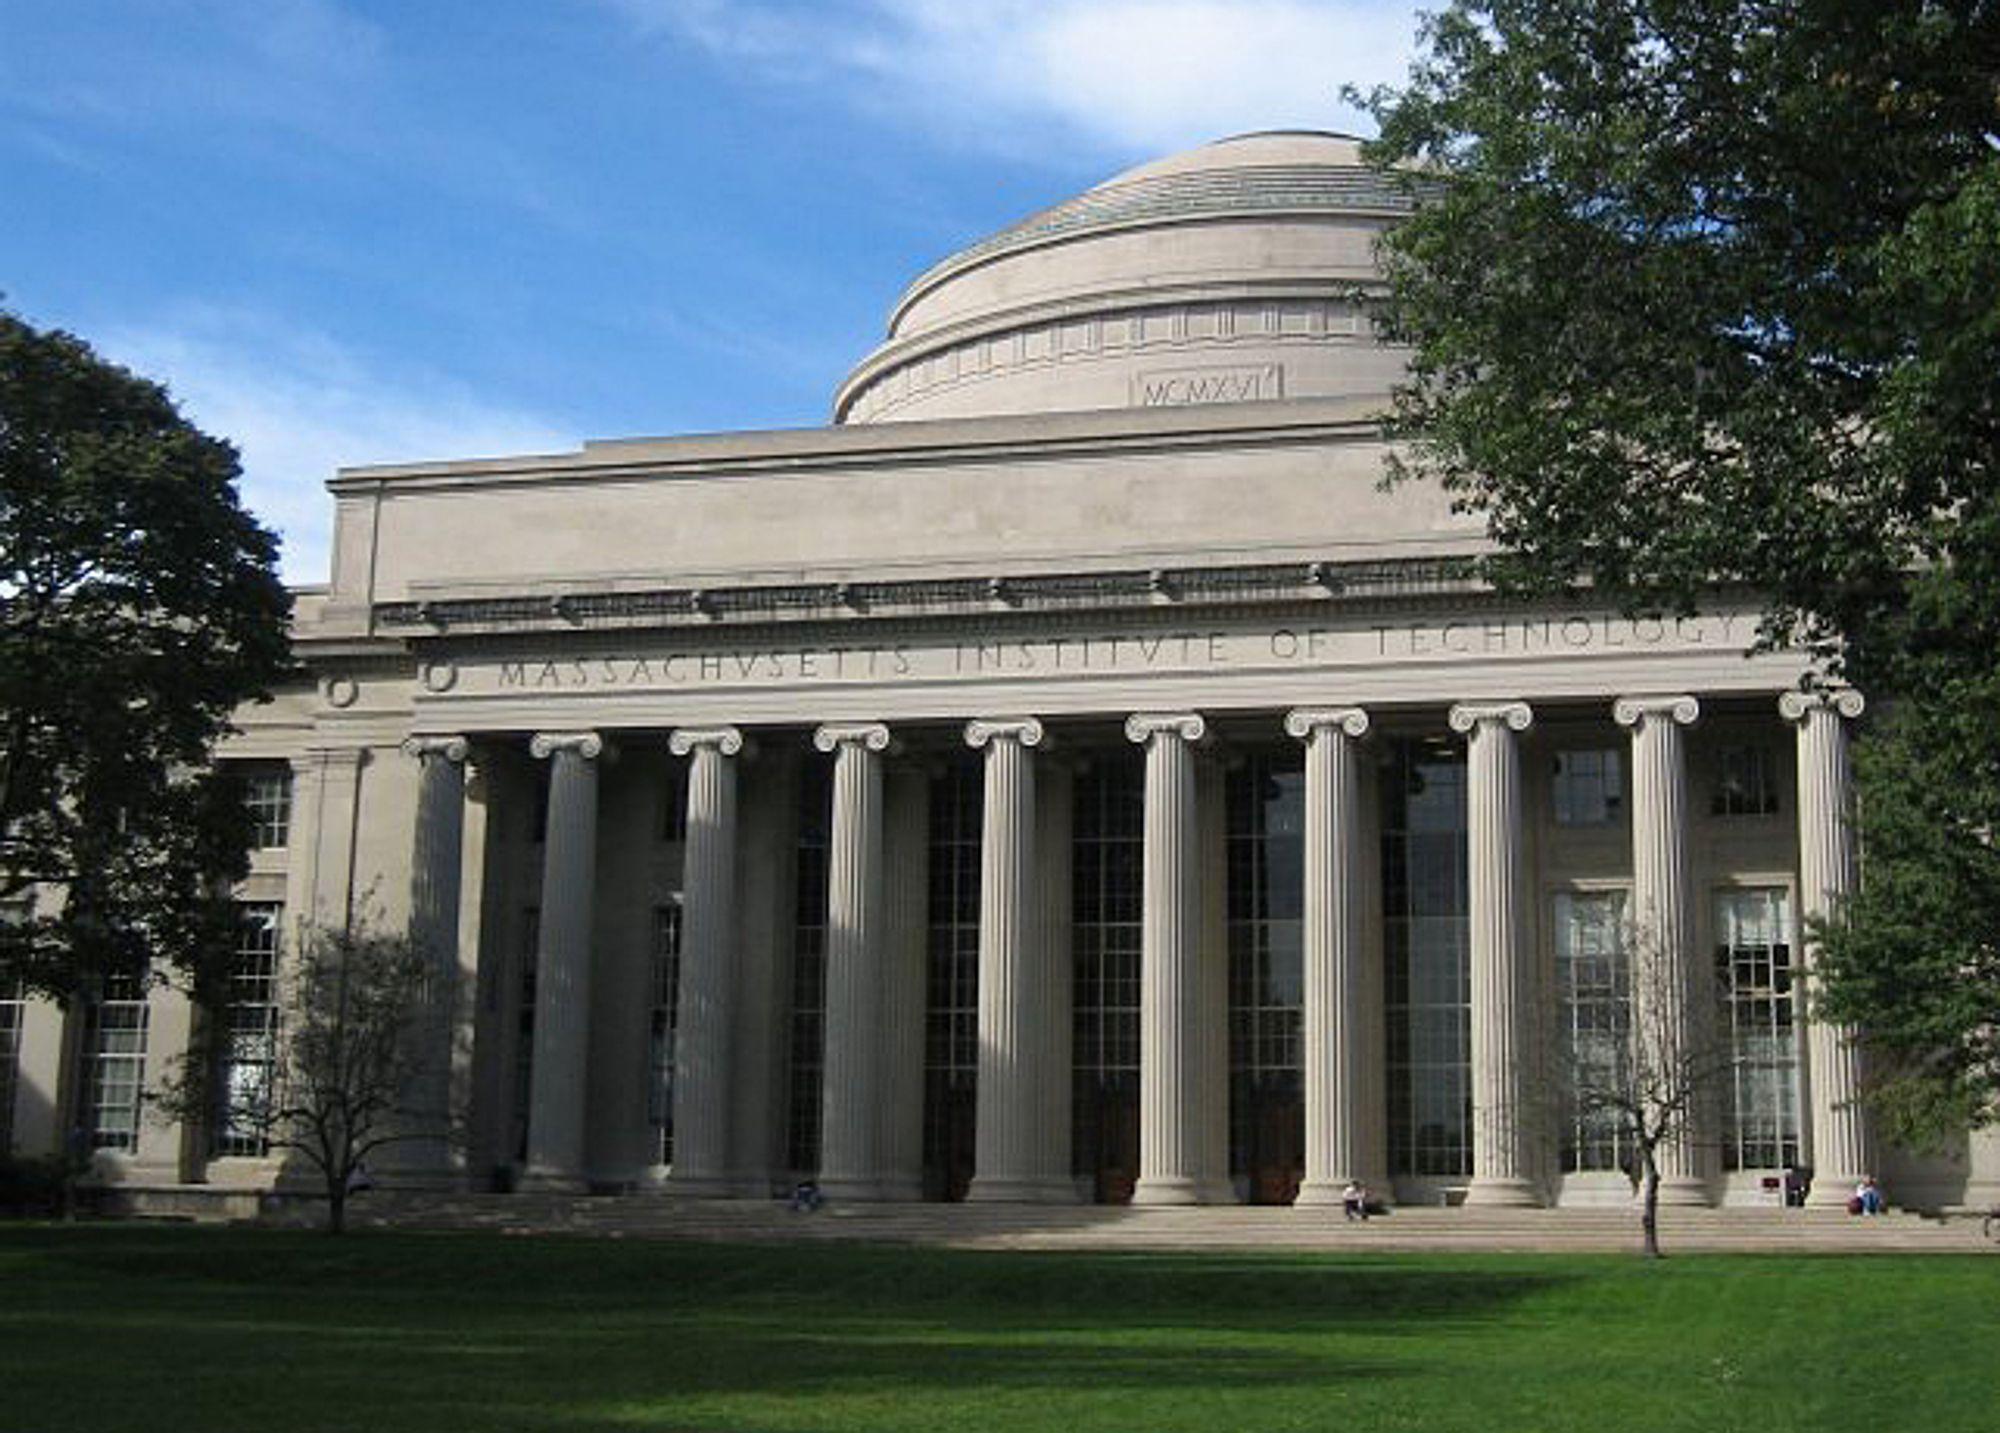 NYTT: MIT er teknologiens utdanningsmessige høyborg.